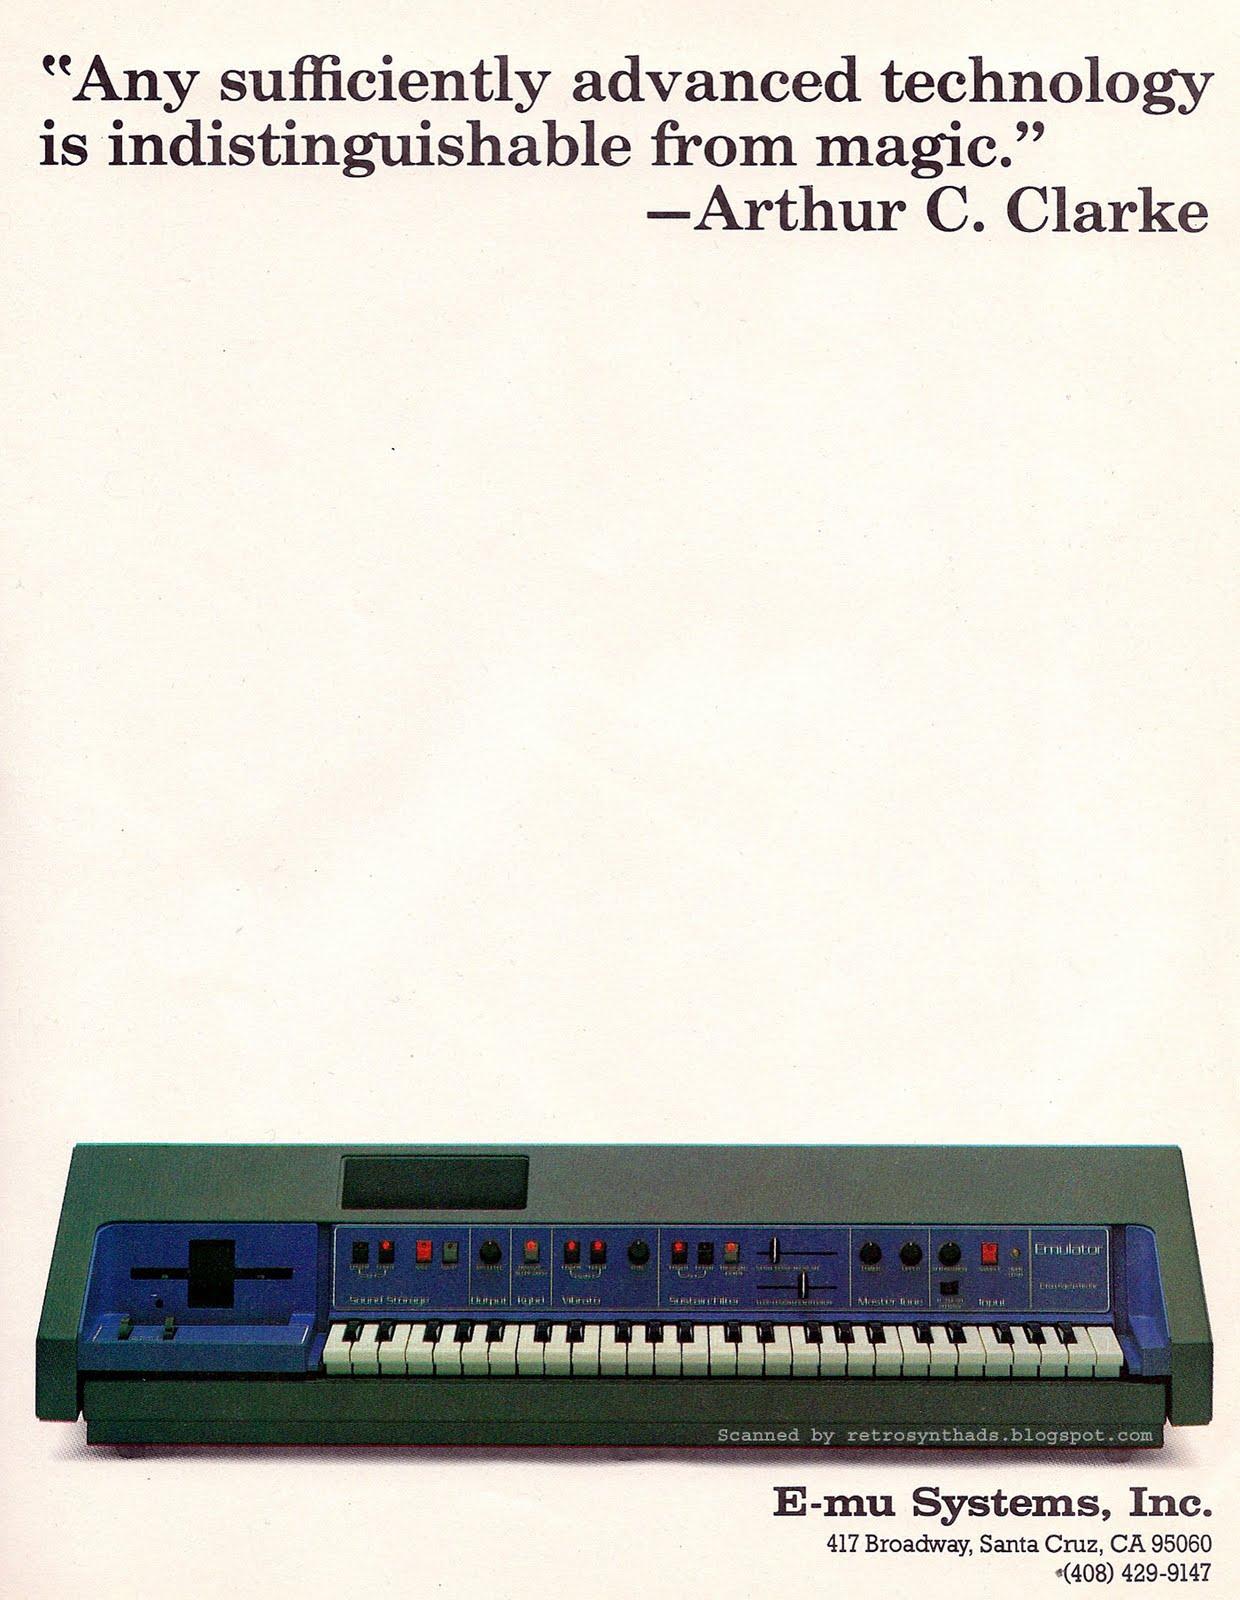 http://retrosynthads.blogspot.ca/2009/11/e-mu-emulator-keyboard-magazine-1982.html